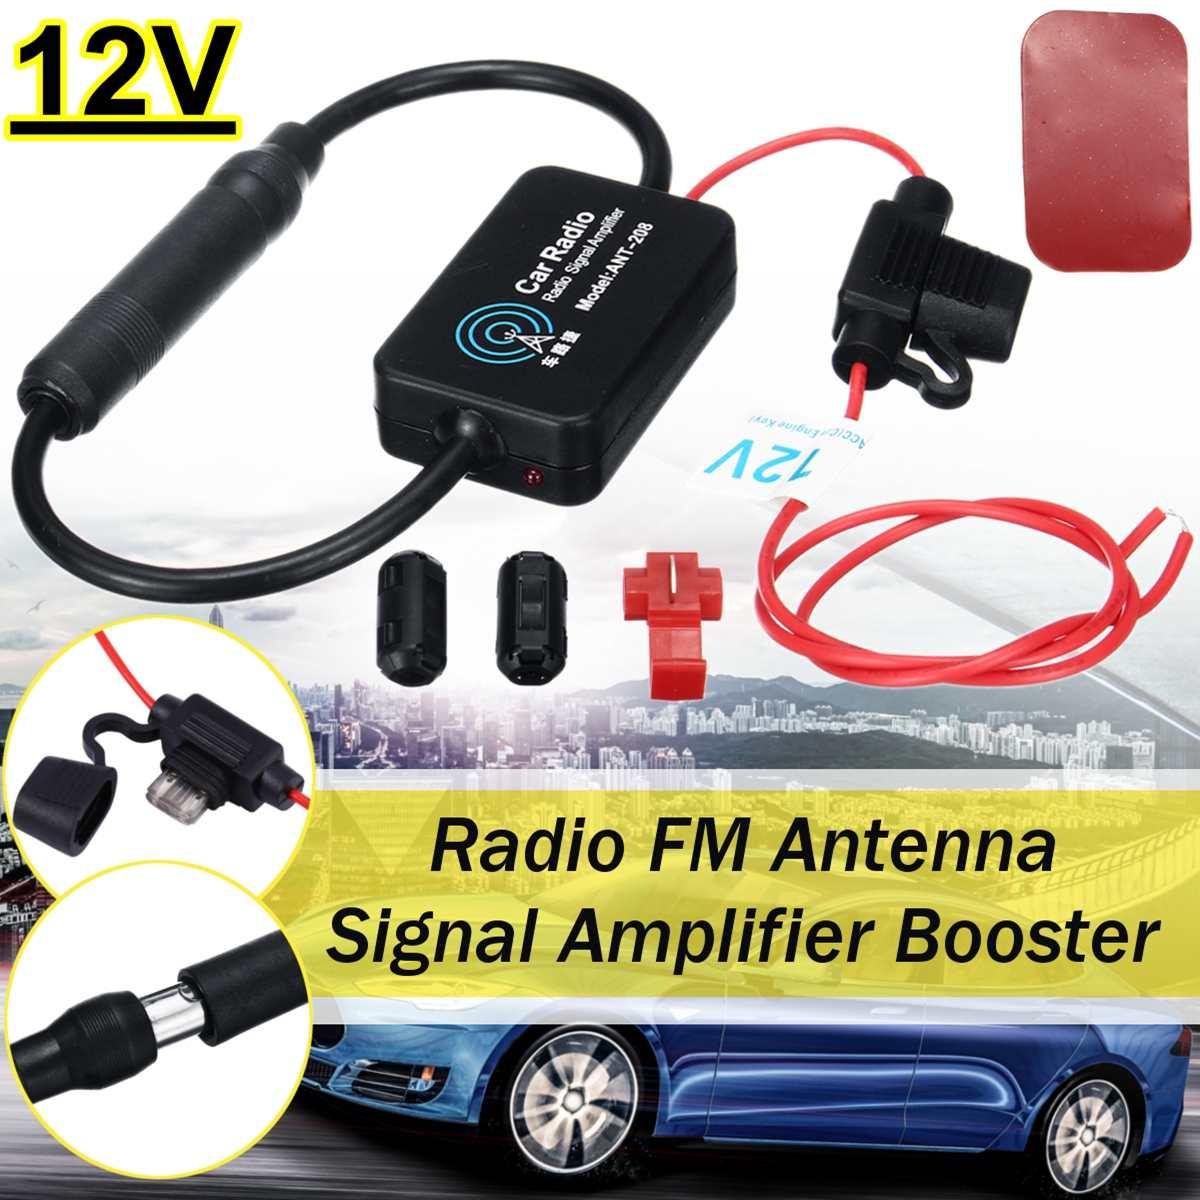 12V ANT-208 Universal Auto Car Radio FM Aerial Antenna Signal Amplifier Booster With Clip Car Radio Aerials Car Accessories